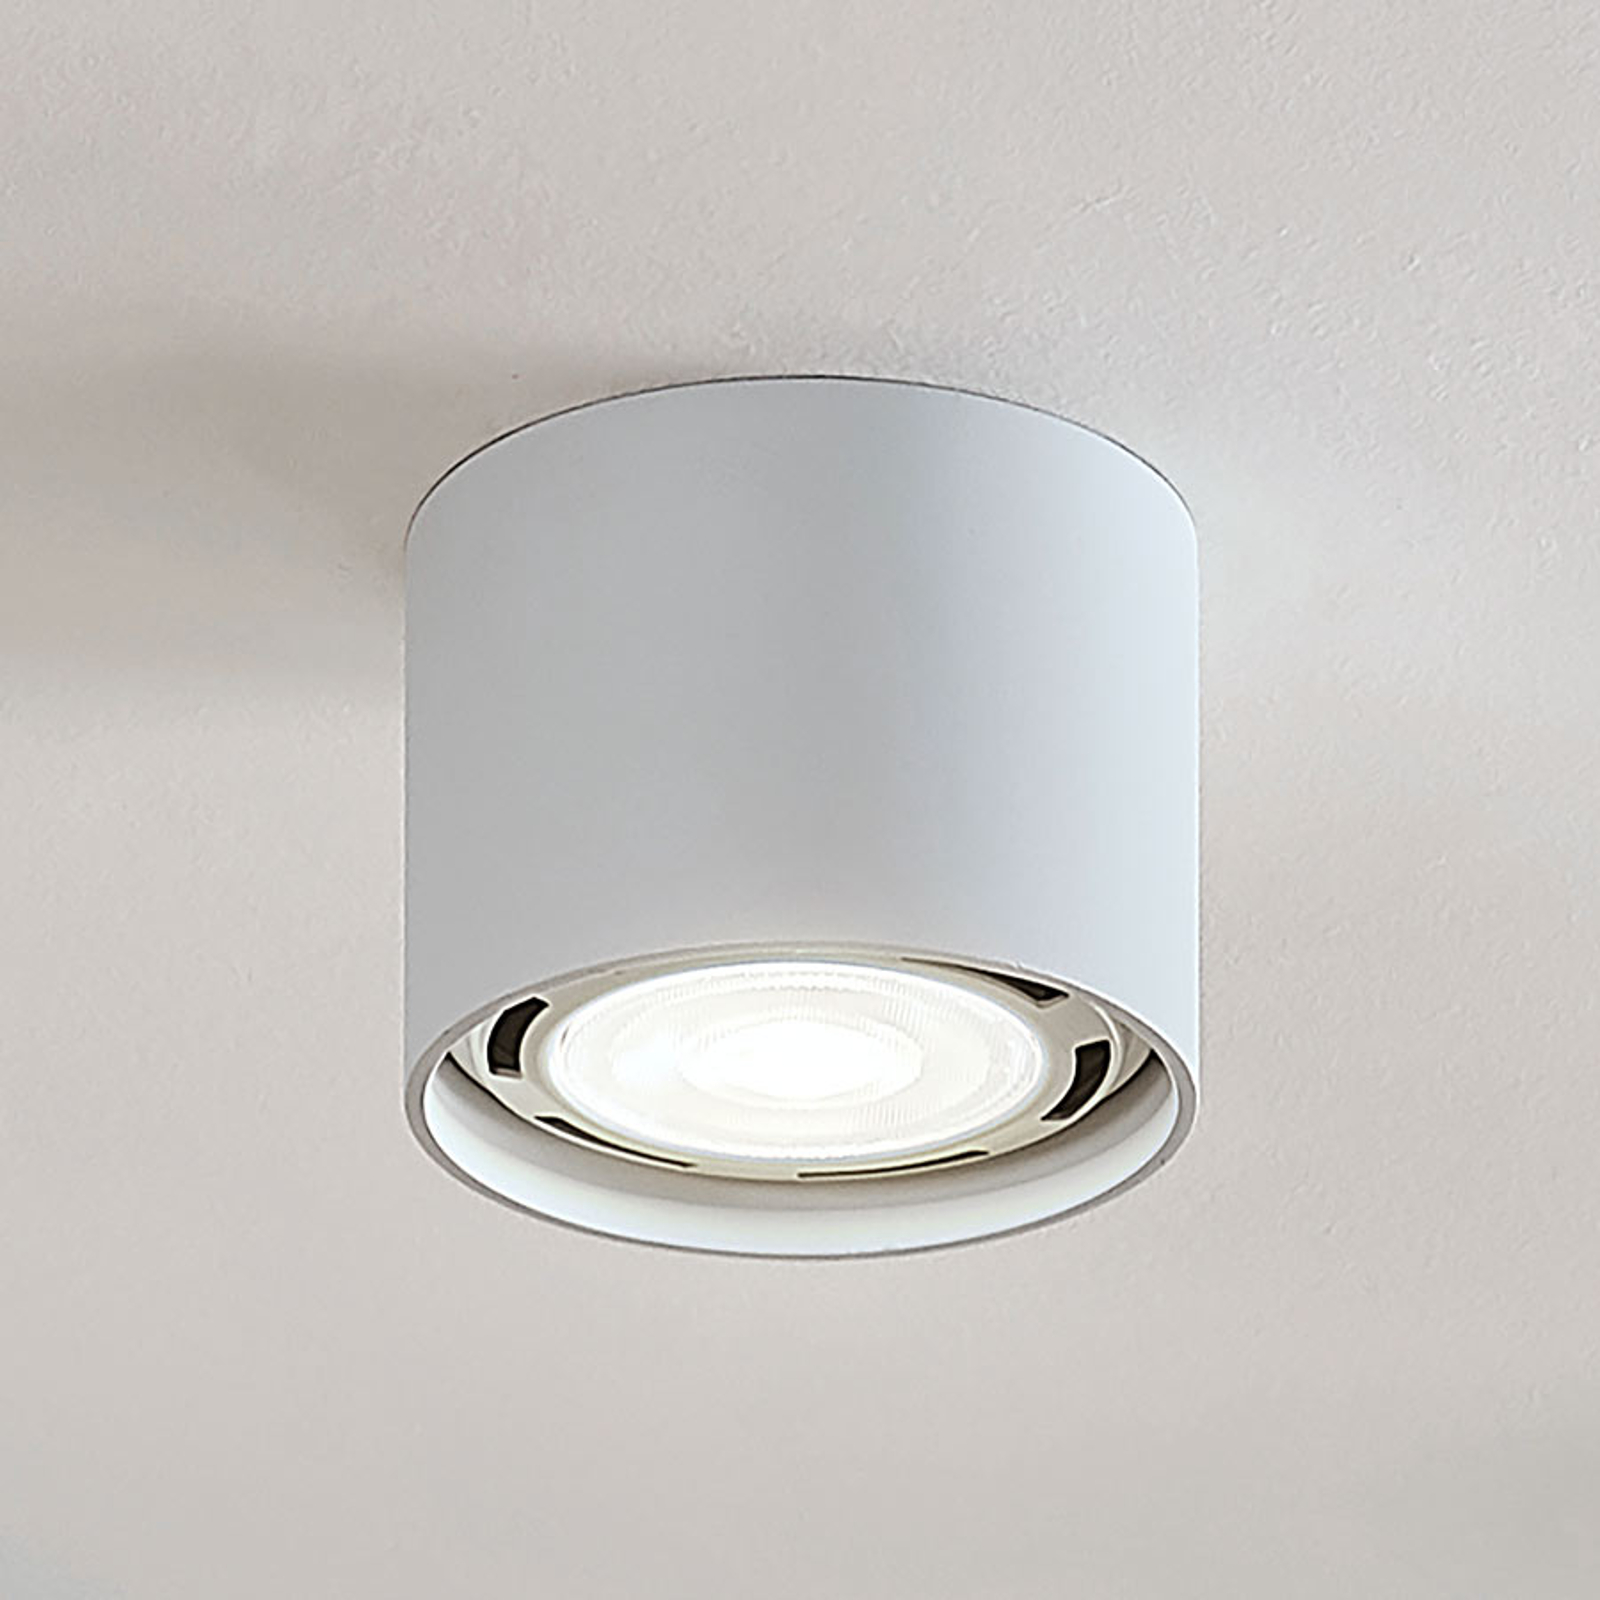 Spot pour plafond LED Mabel, rond, blanc